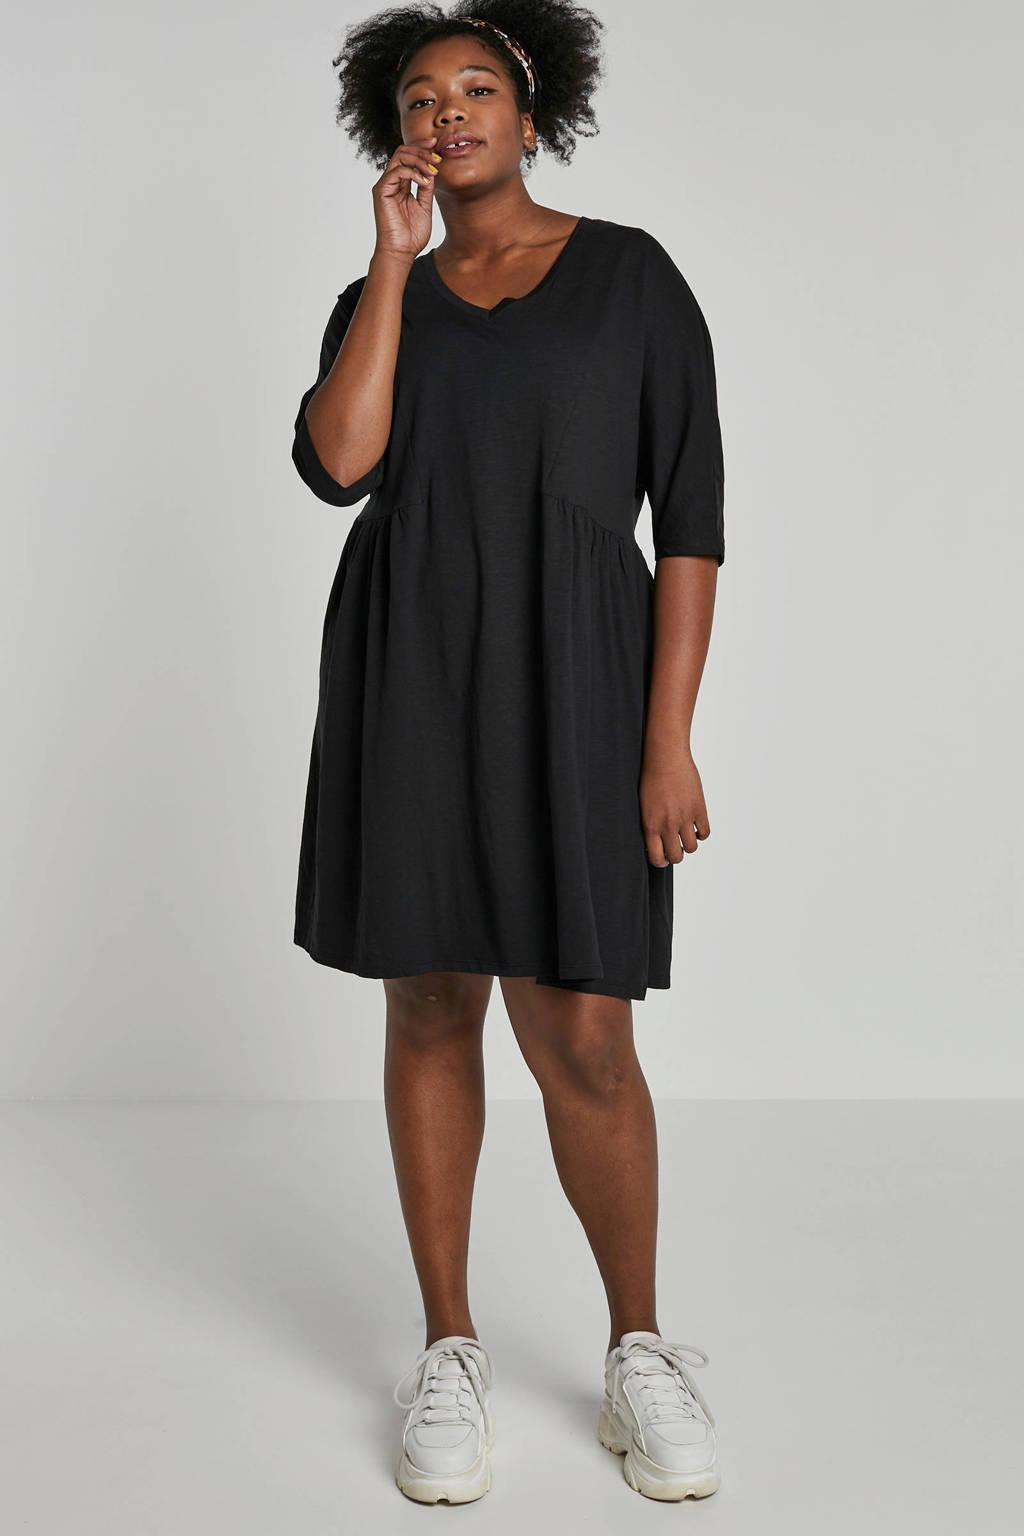 JUNAROSE jurk met V-hals, Zwart